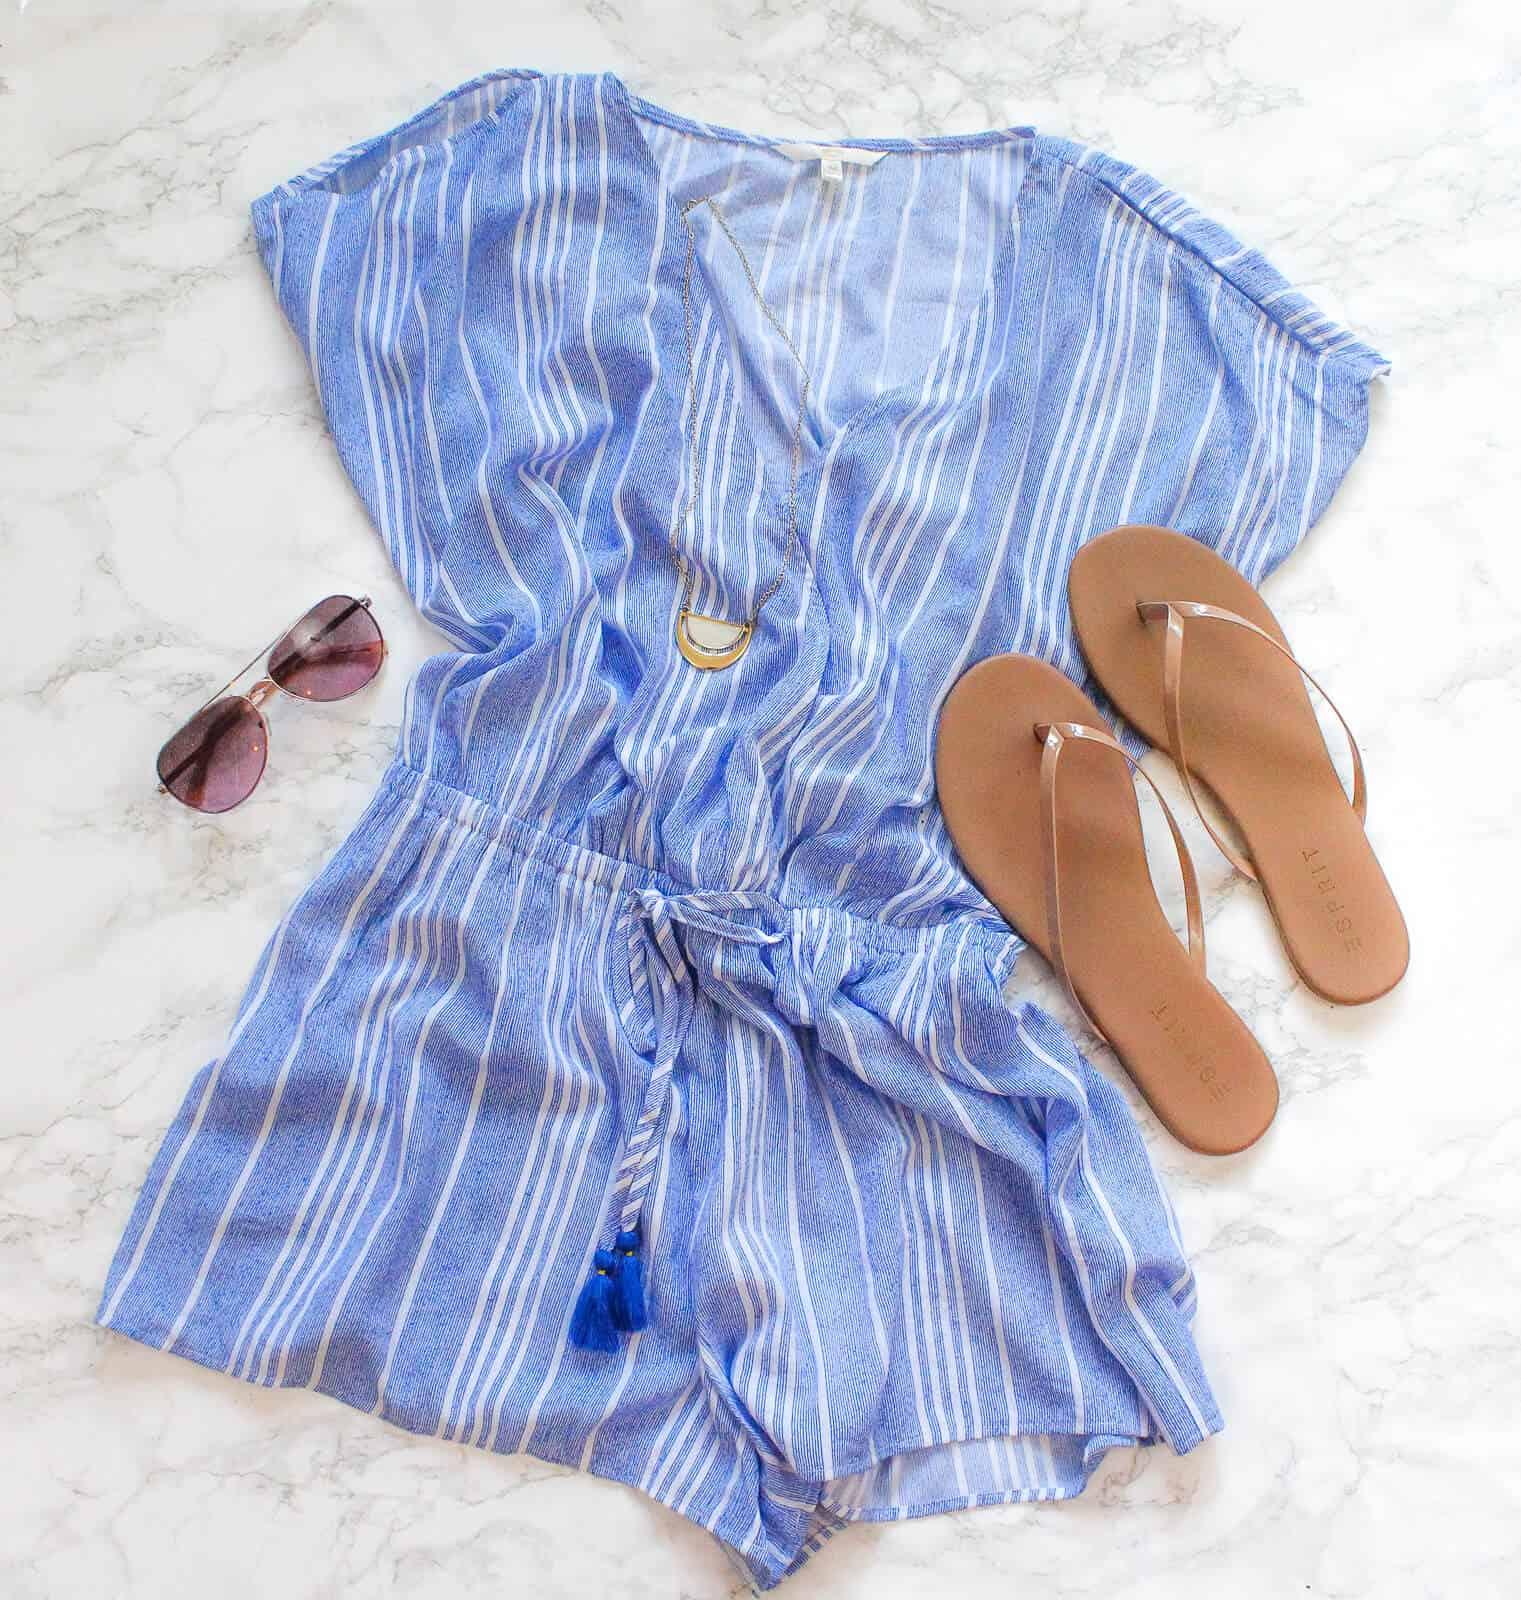 Blue summer dress next to flip flops and sunglasses.